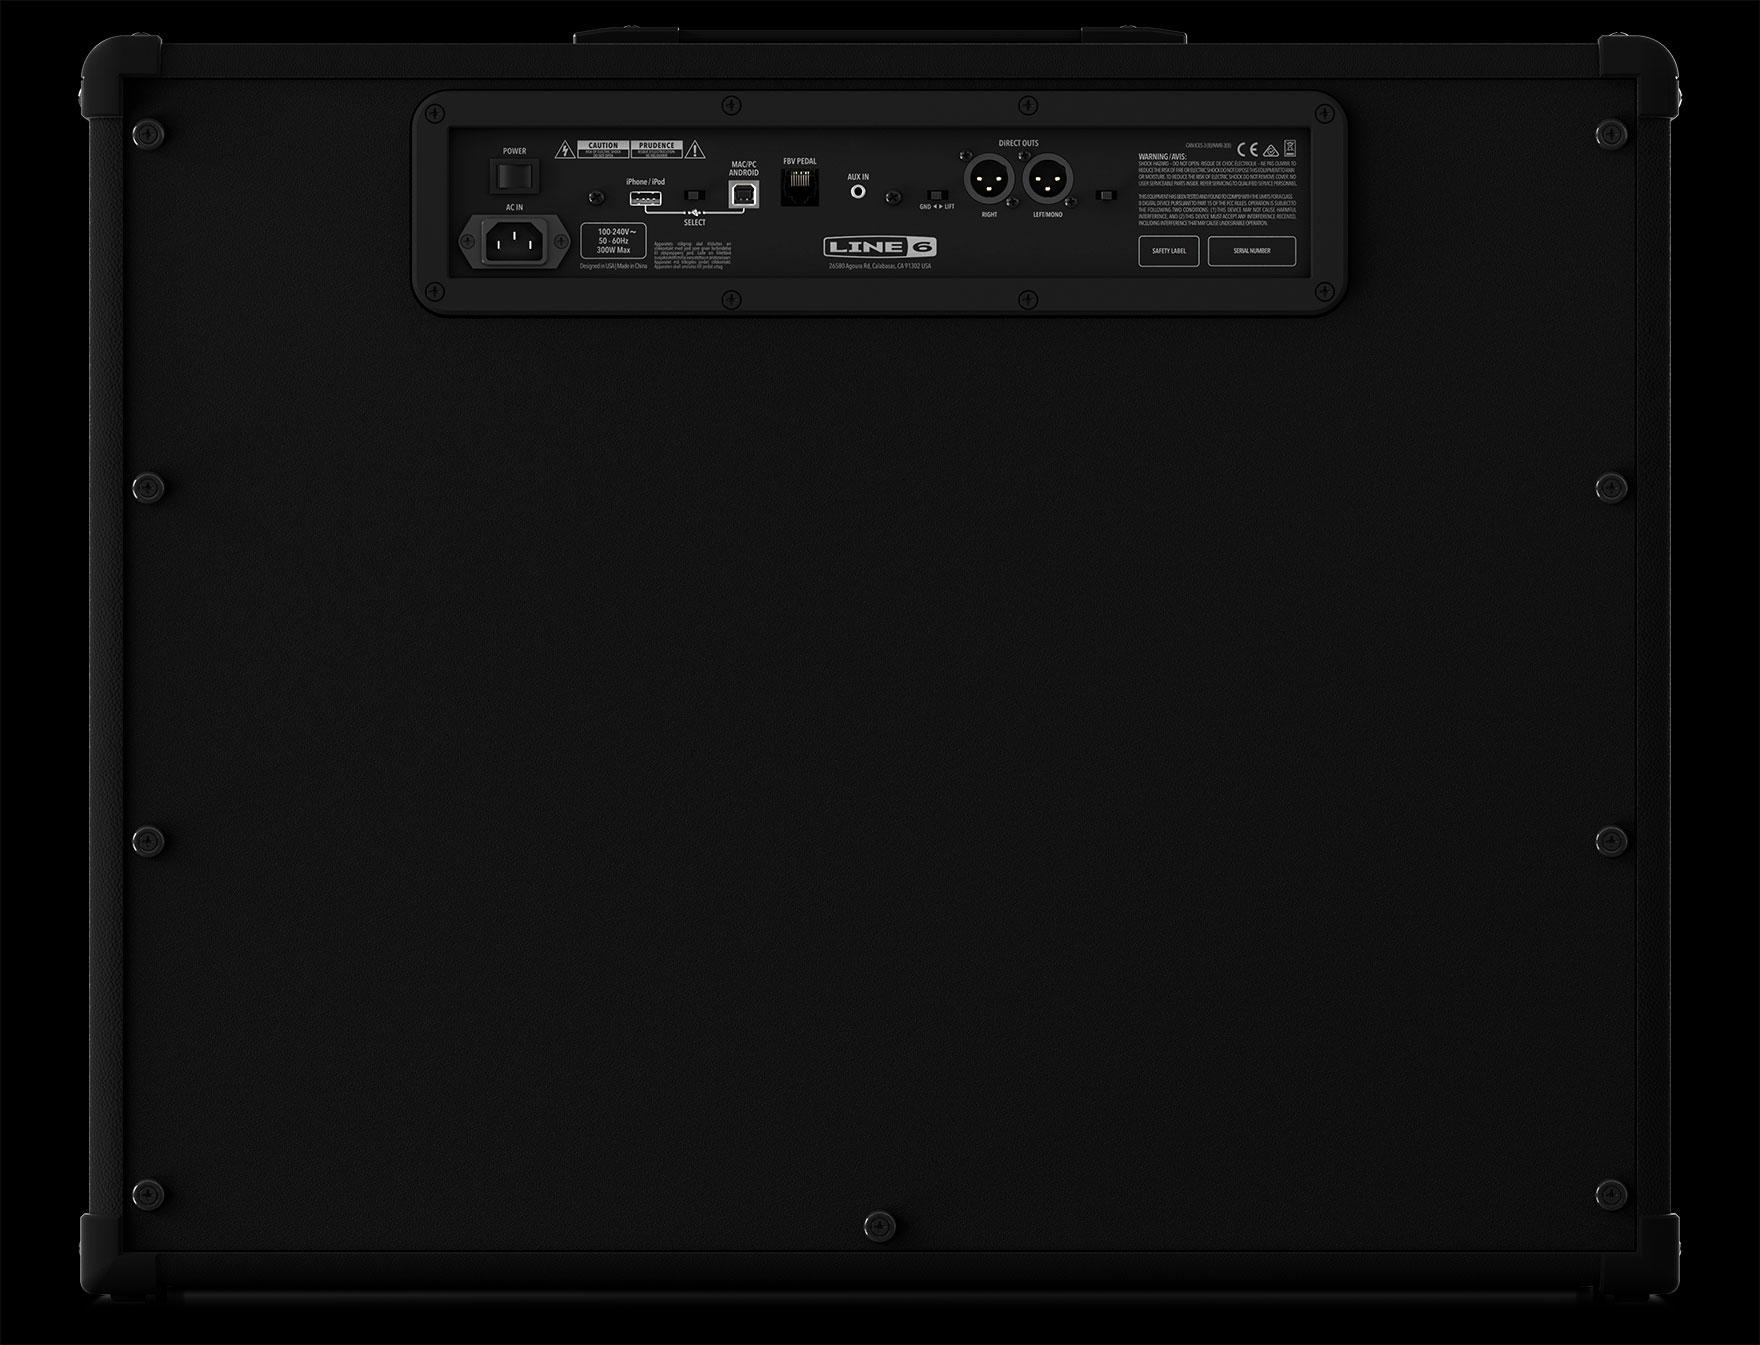 Spider V Uniton 50 60 Watt Amplifier Head Wiring Diagram 240 Buy Now